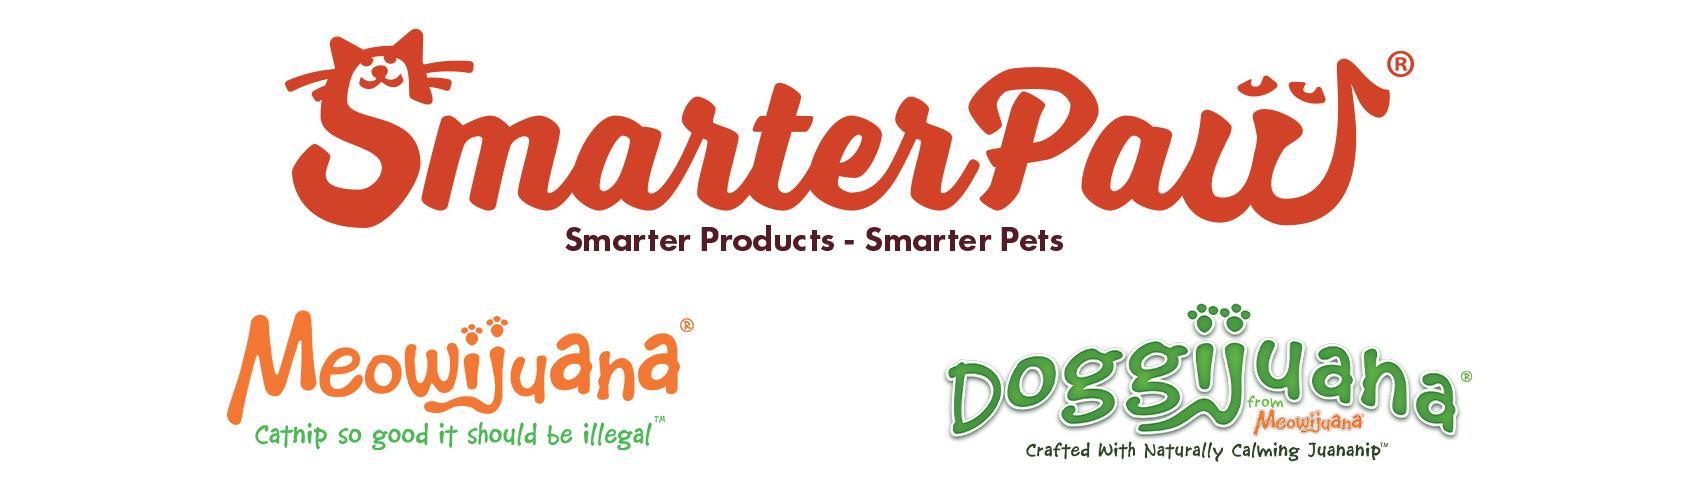 SmarterPaw, LLC | Meowijuana® | Doggijuana®